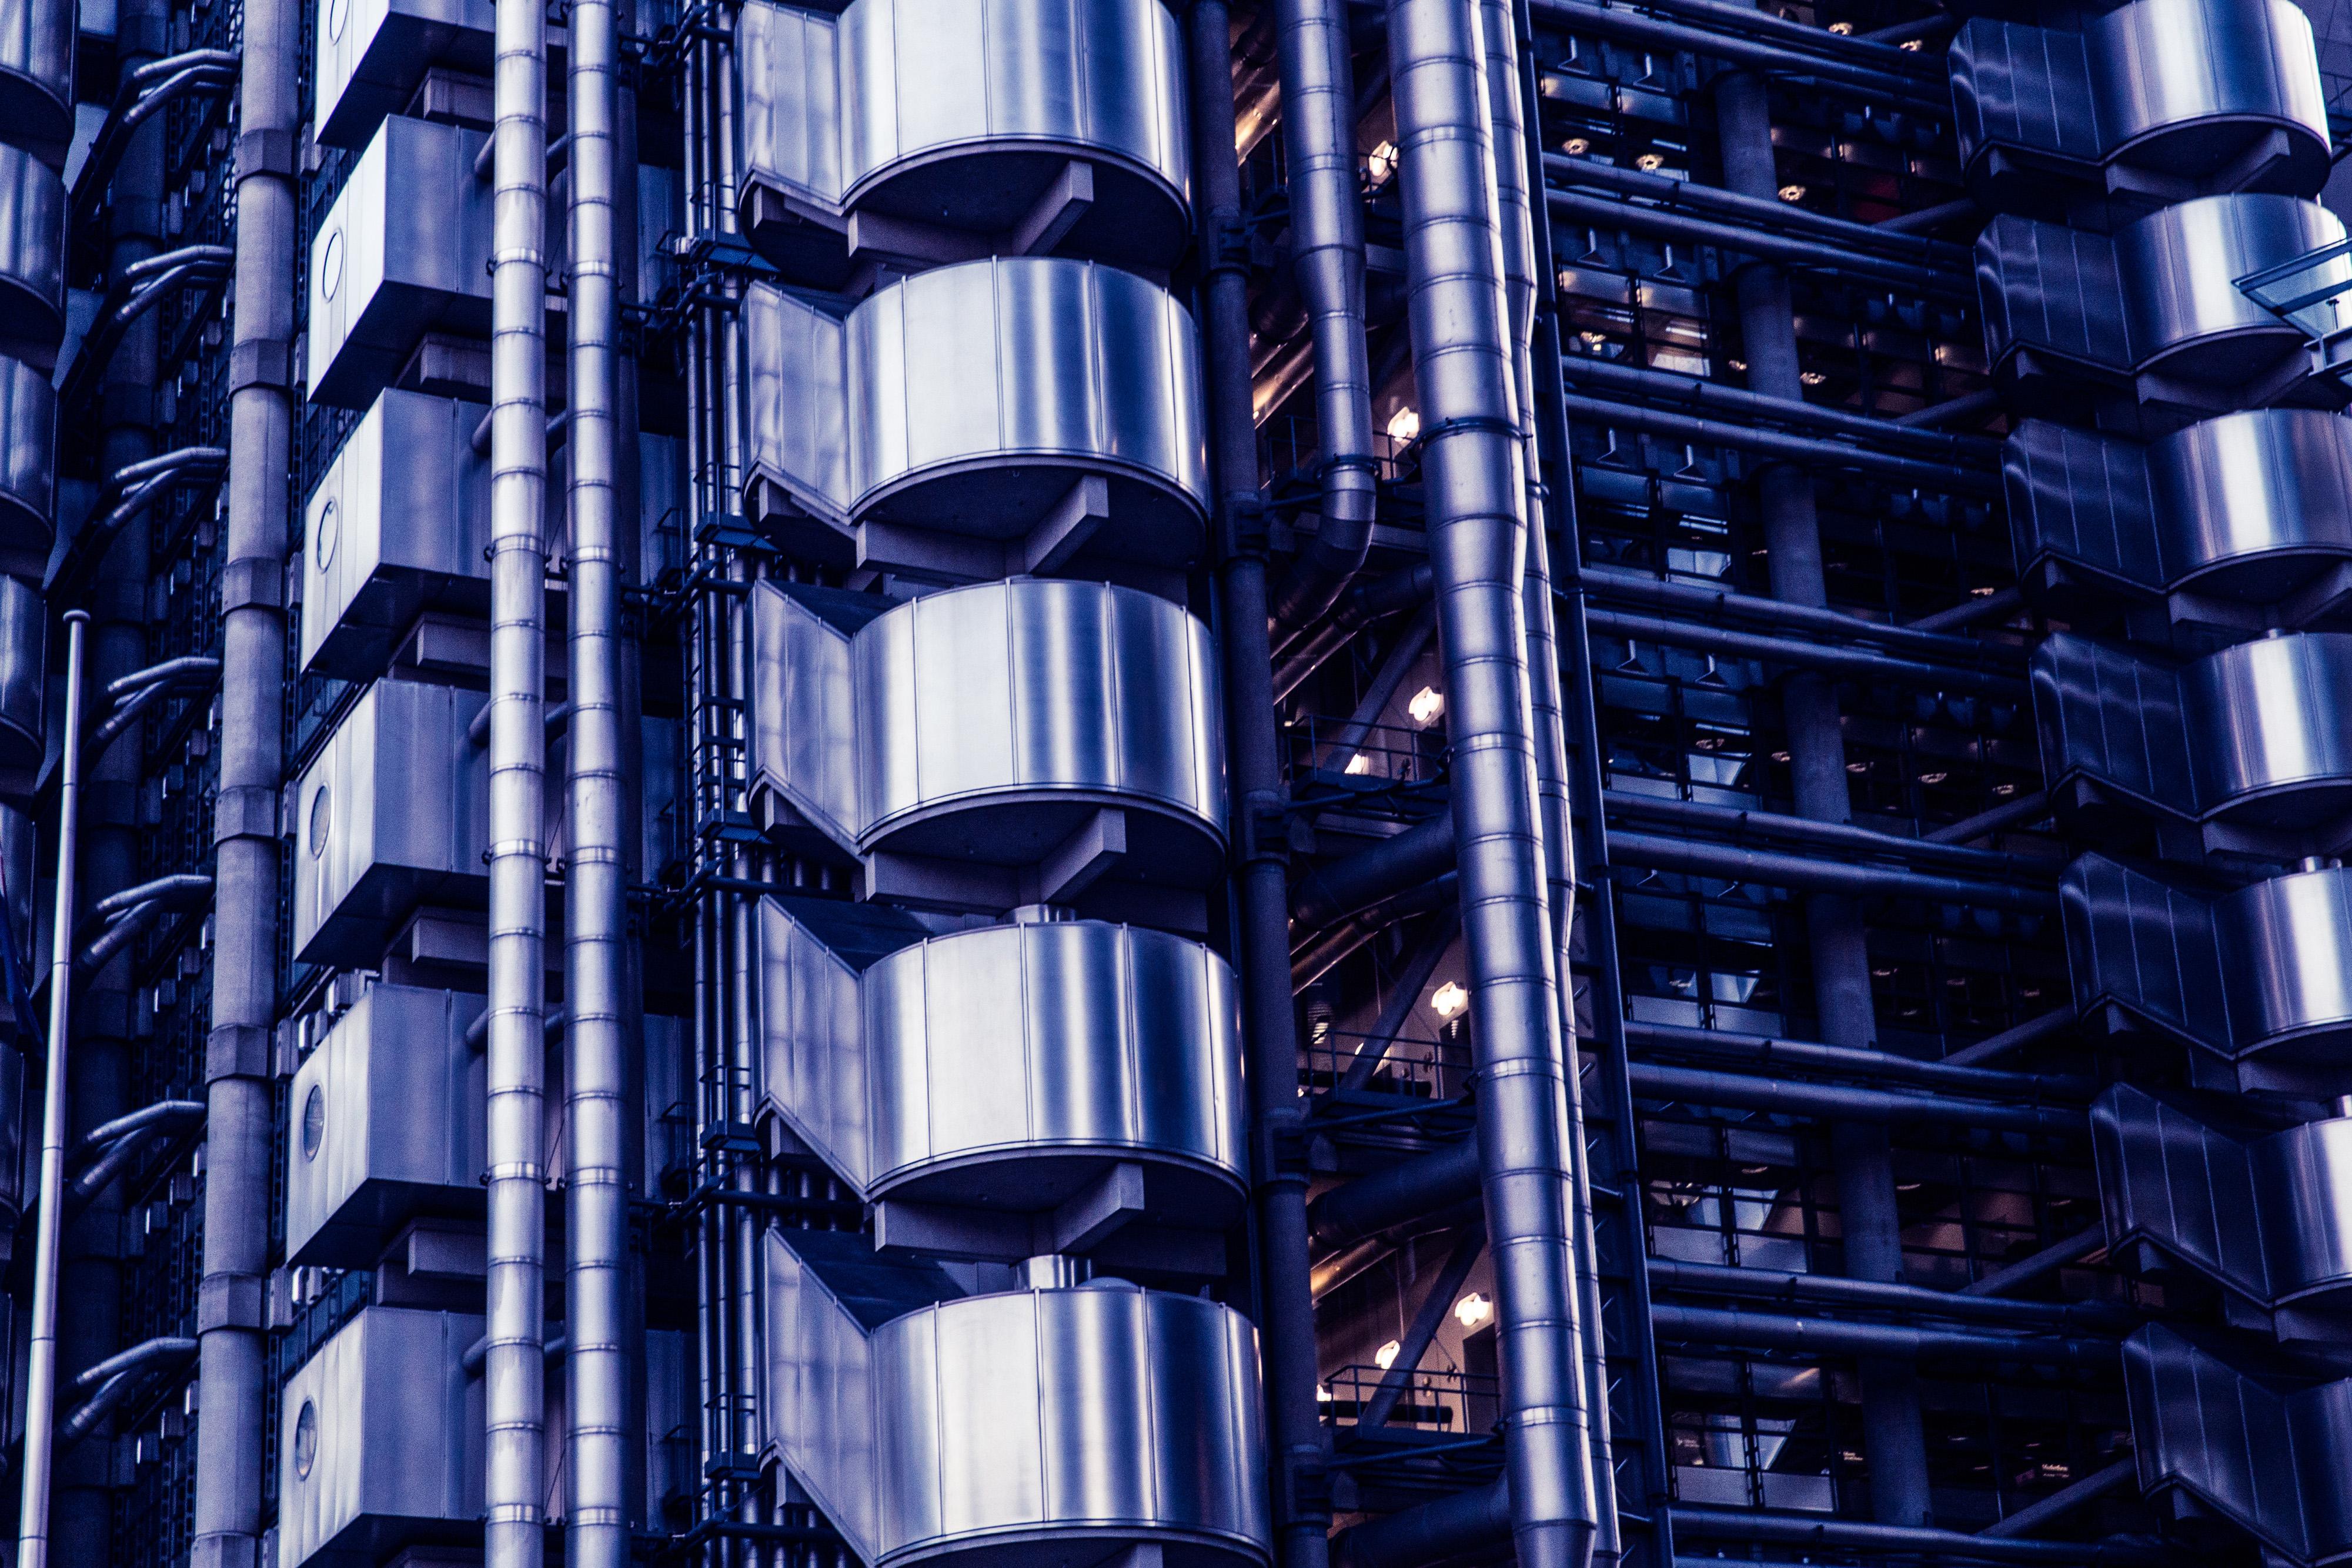 lloyds building London - Richard Rogers, arquitectura, metal, edificio, Ivan Harbour, Mike Davies, Lloyd's